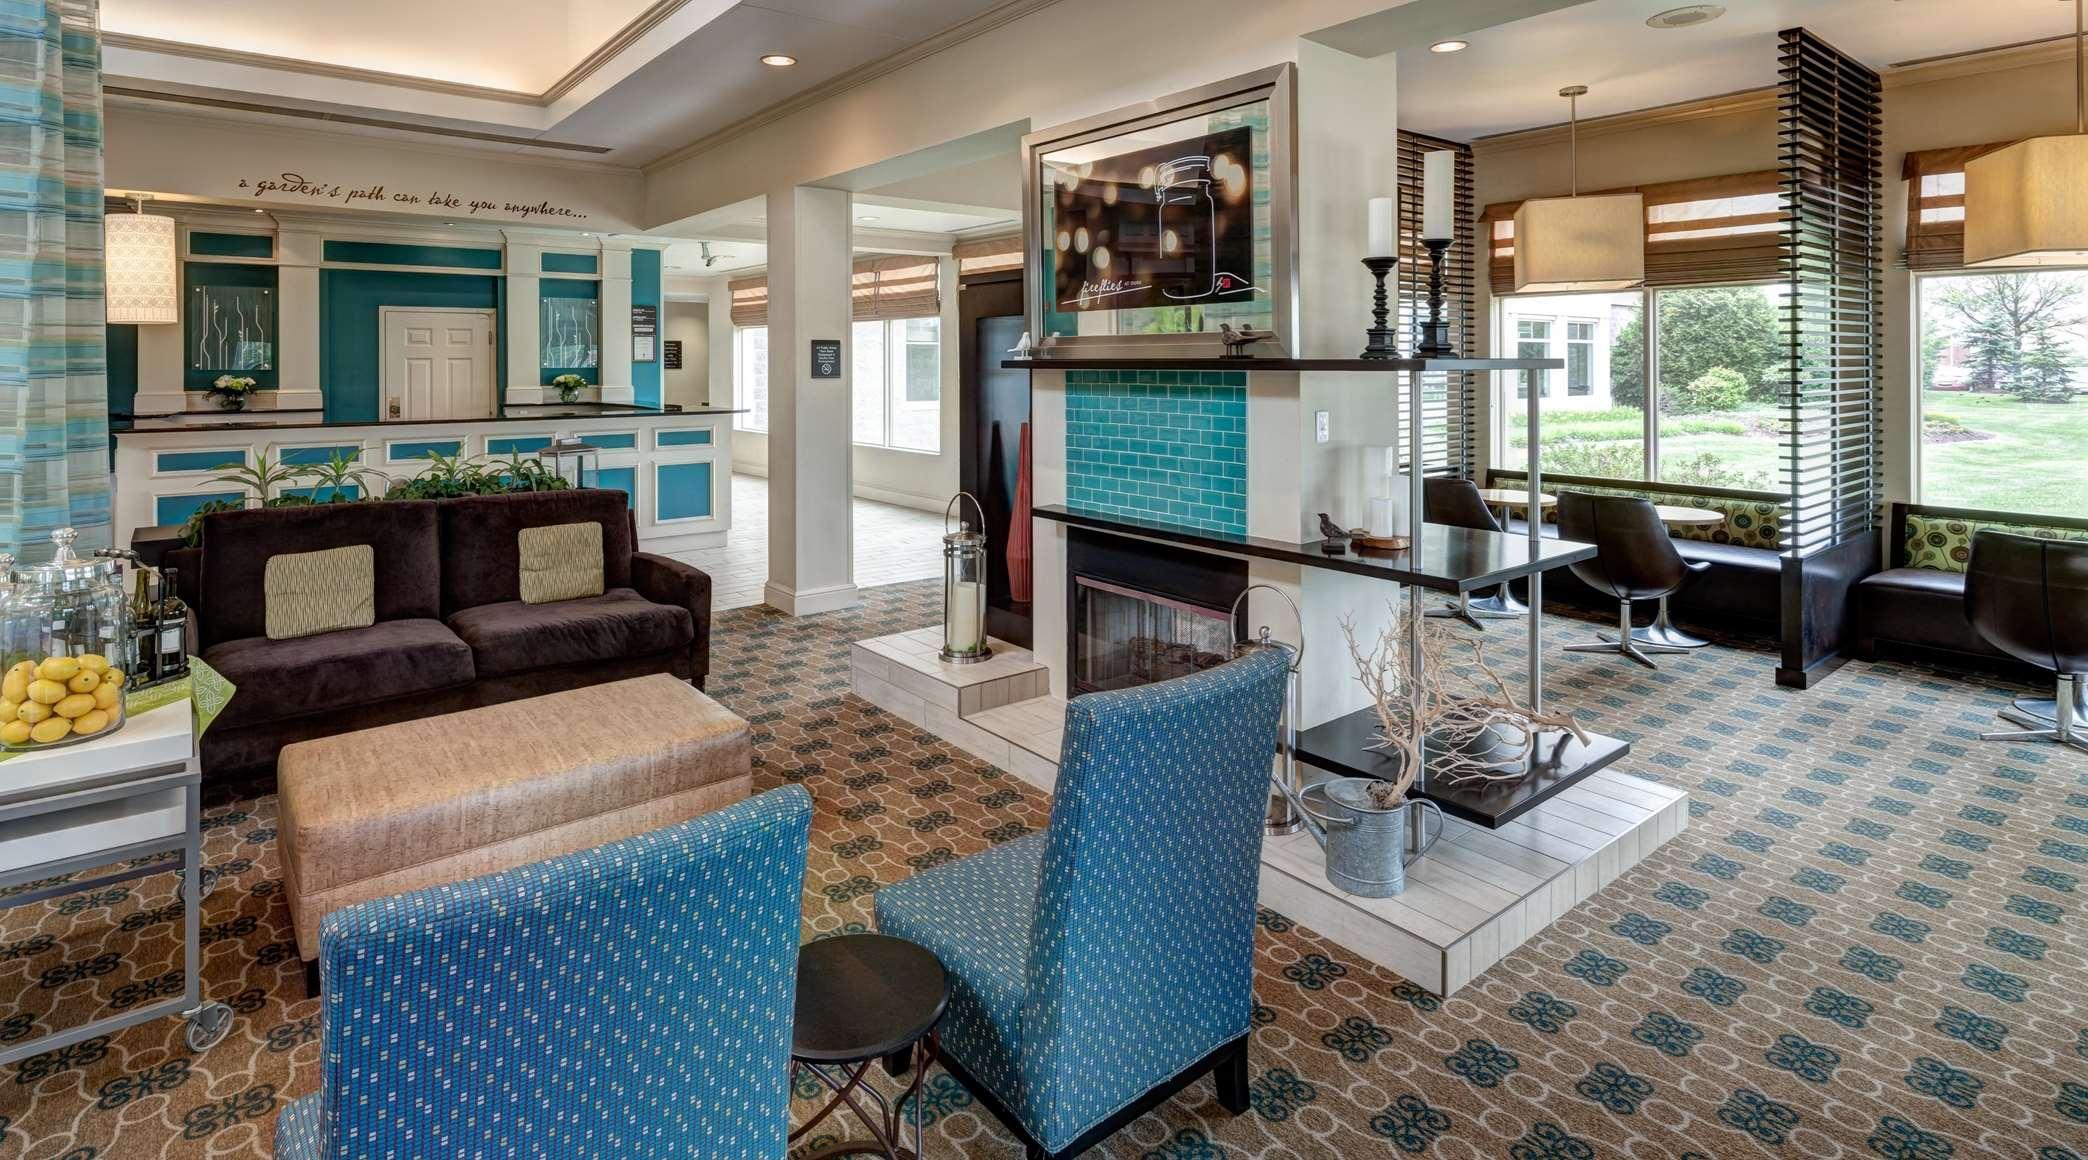 Hilton Garden Inn Rockaway image 10